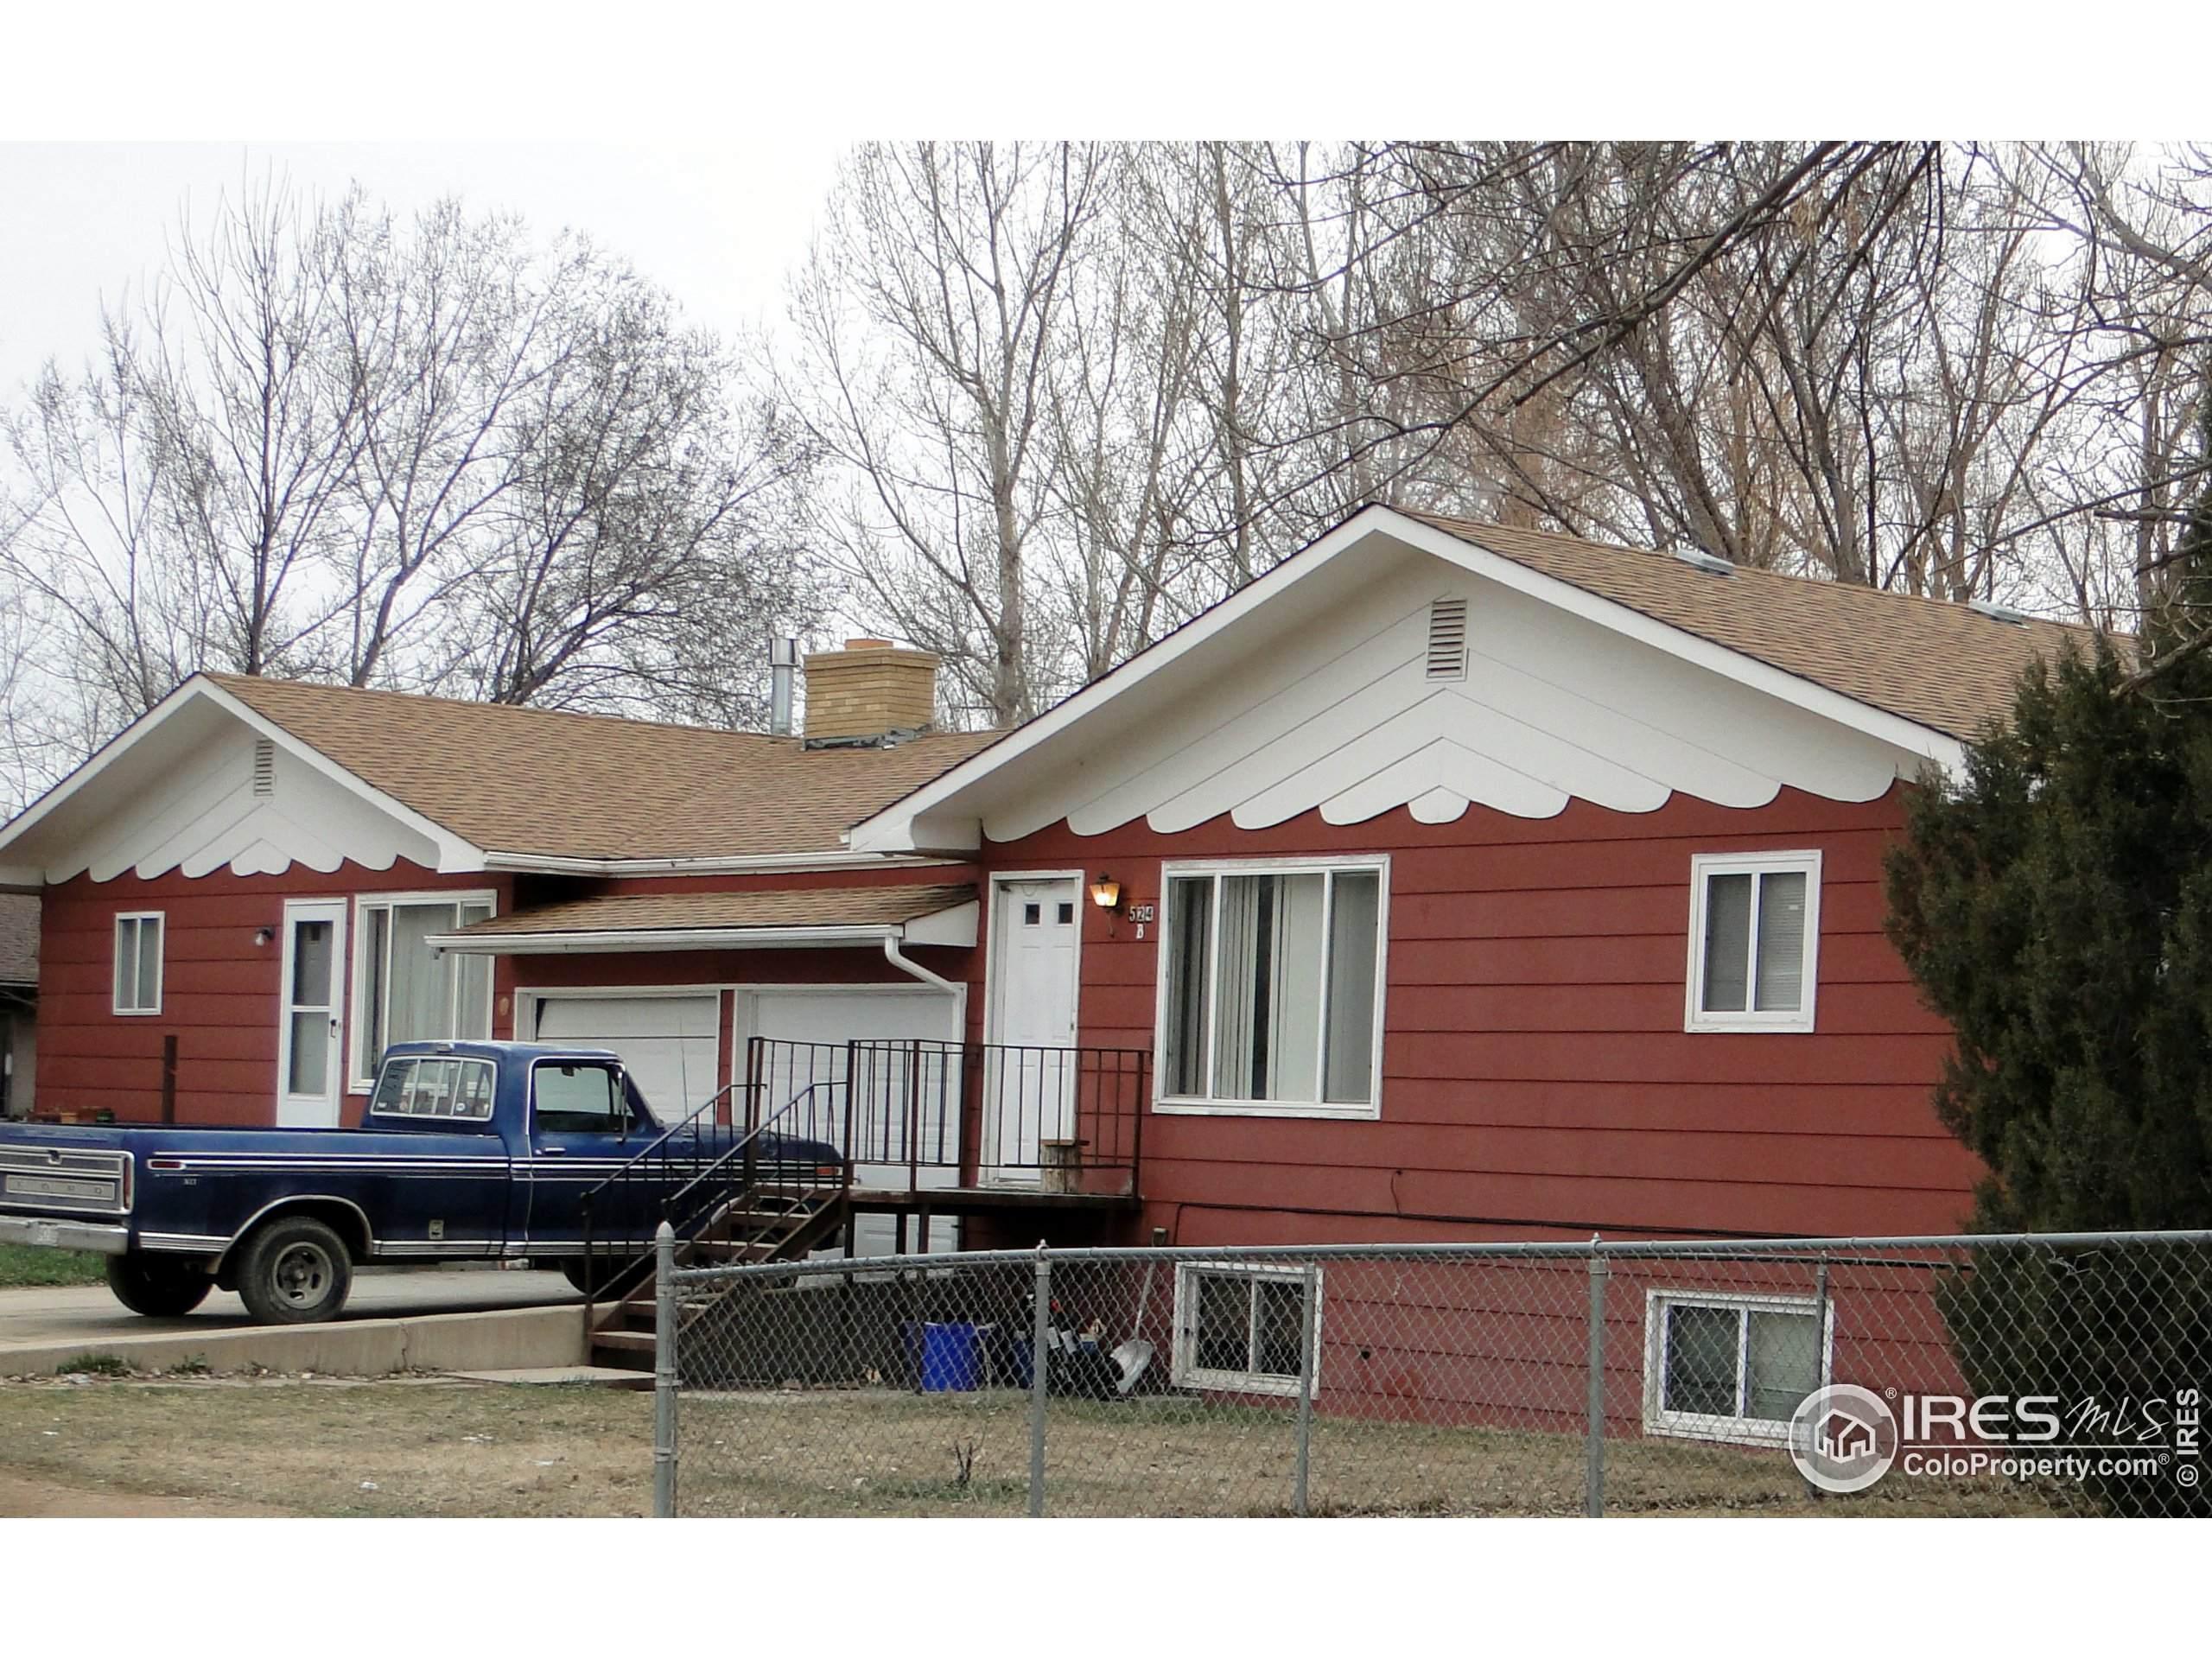 22687 Shawnee Rd, Indian Hills, CO 80454 (MLS #940119) :: RE/MAX Alliance